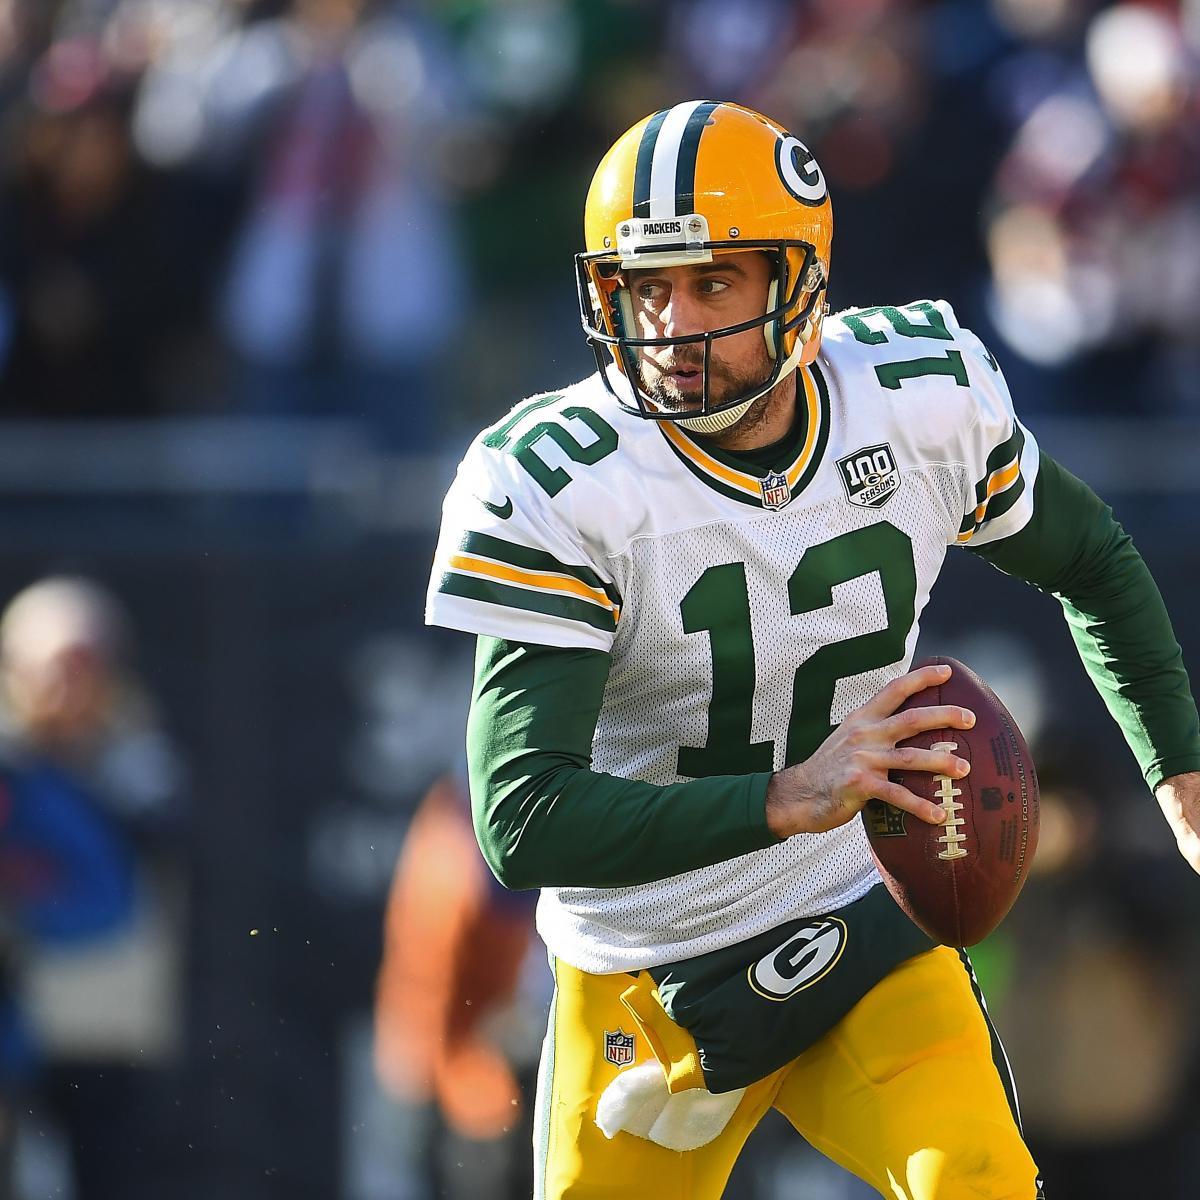 2019 NFL Schedule Leaks: Latest Rumors Ahead of Official ...Steelers Schedule